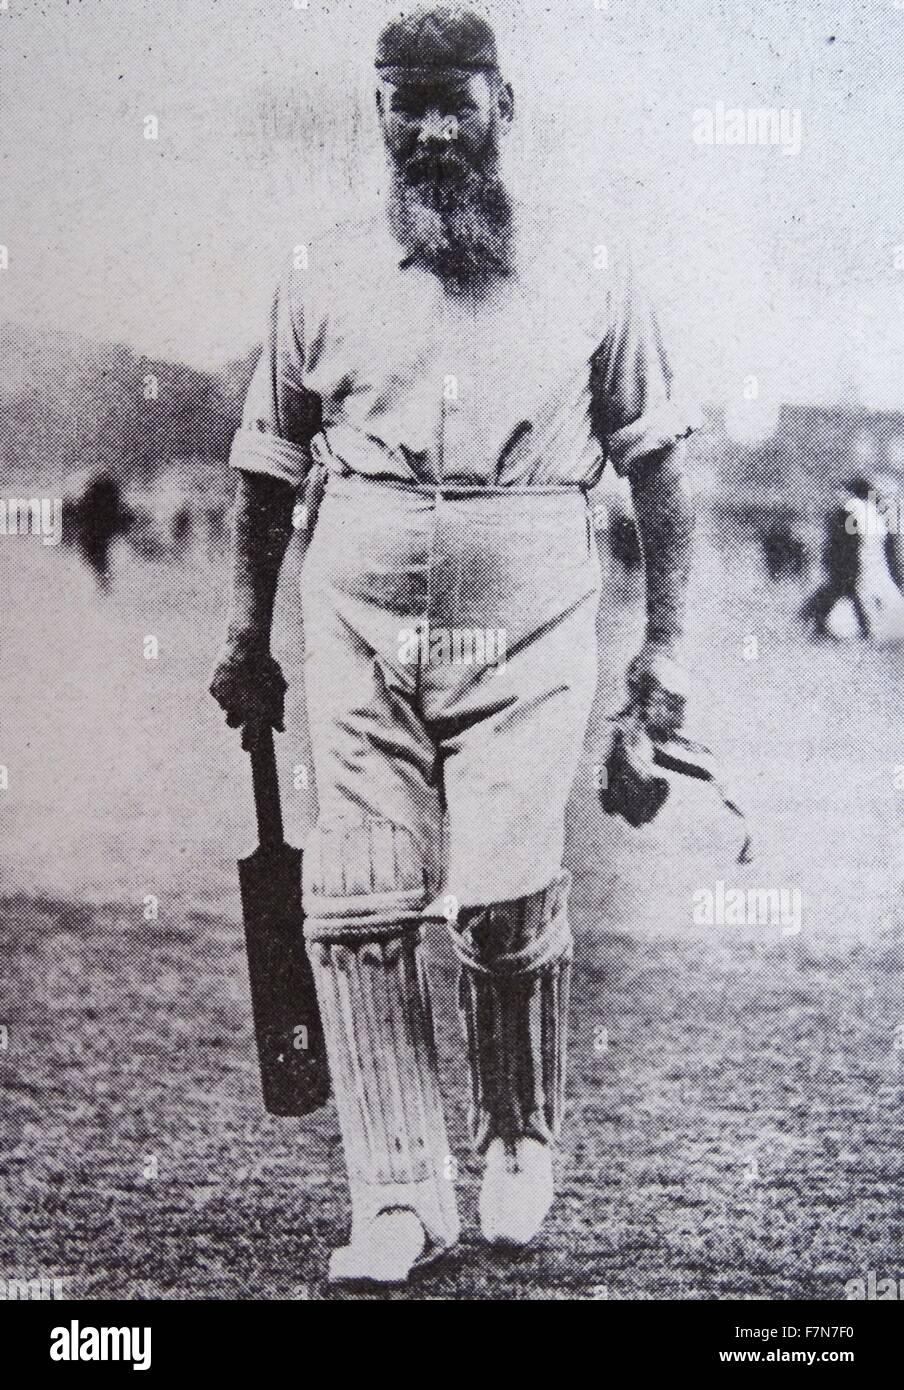 Dr. William Gilbert Grace (1848-1915), cricketer of legendary fame. - Stock Image